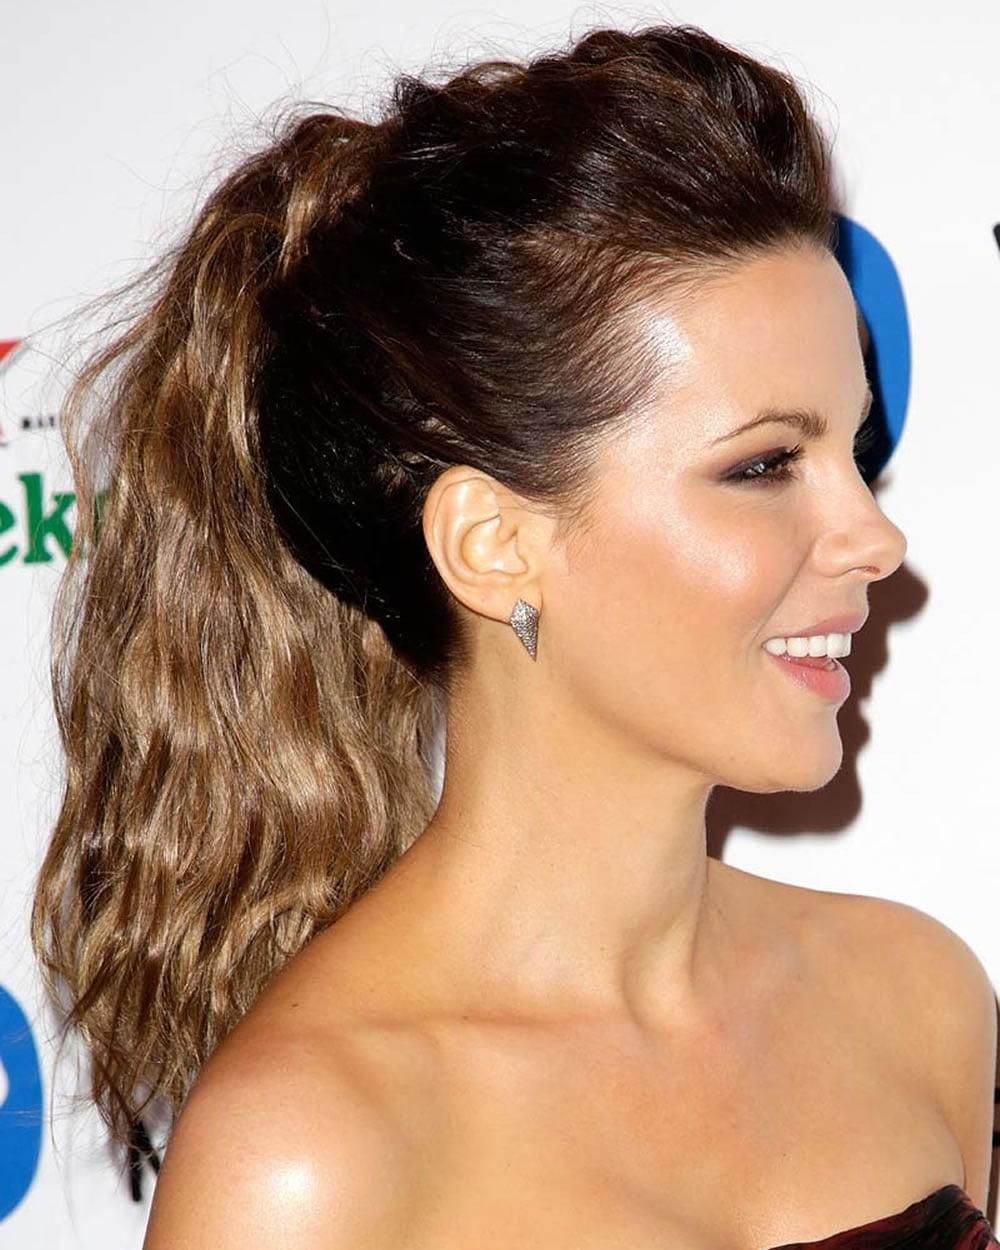 26 Cute ponytail hairstyles (curly, weave, high, sleek, drawstring ...